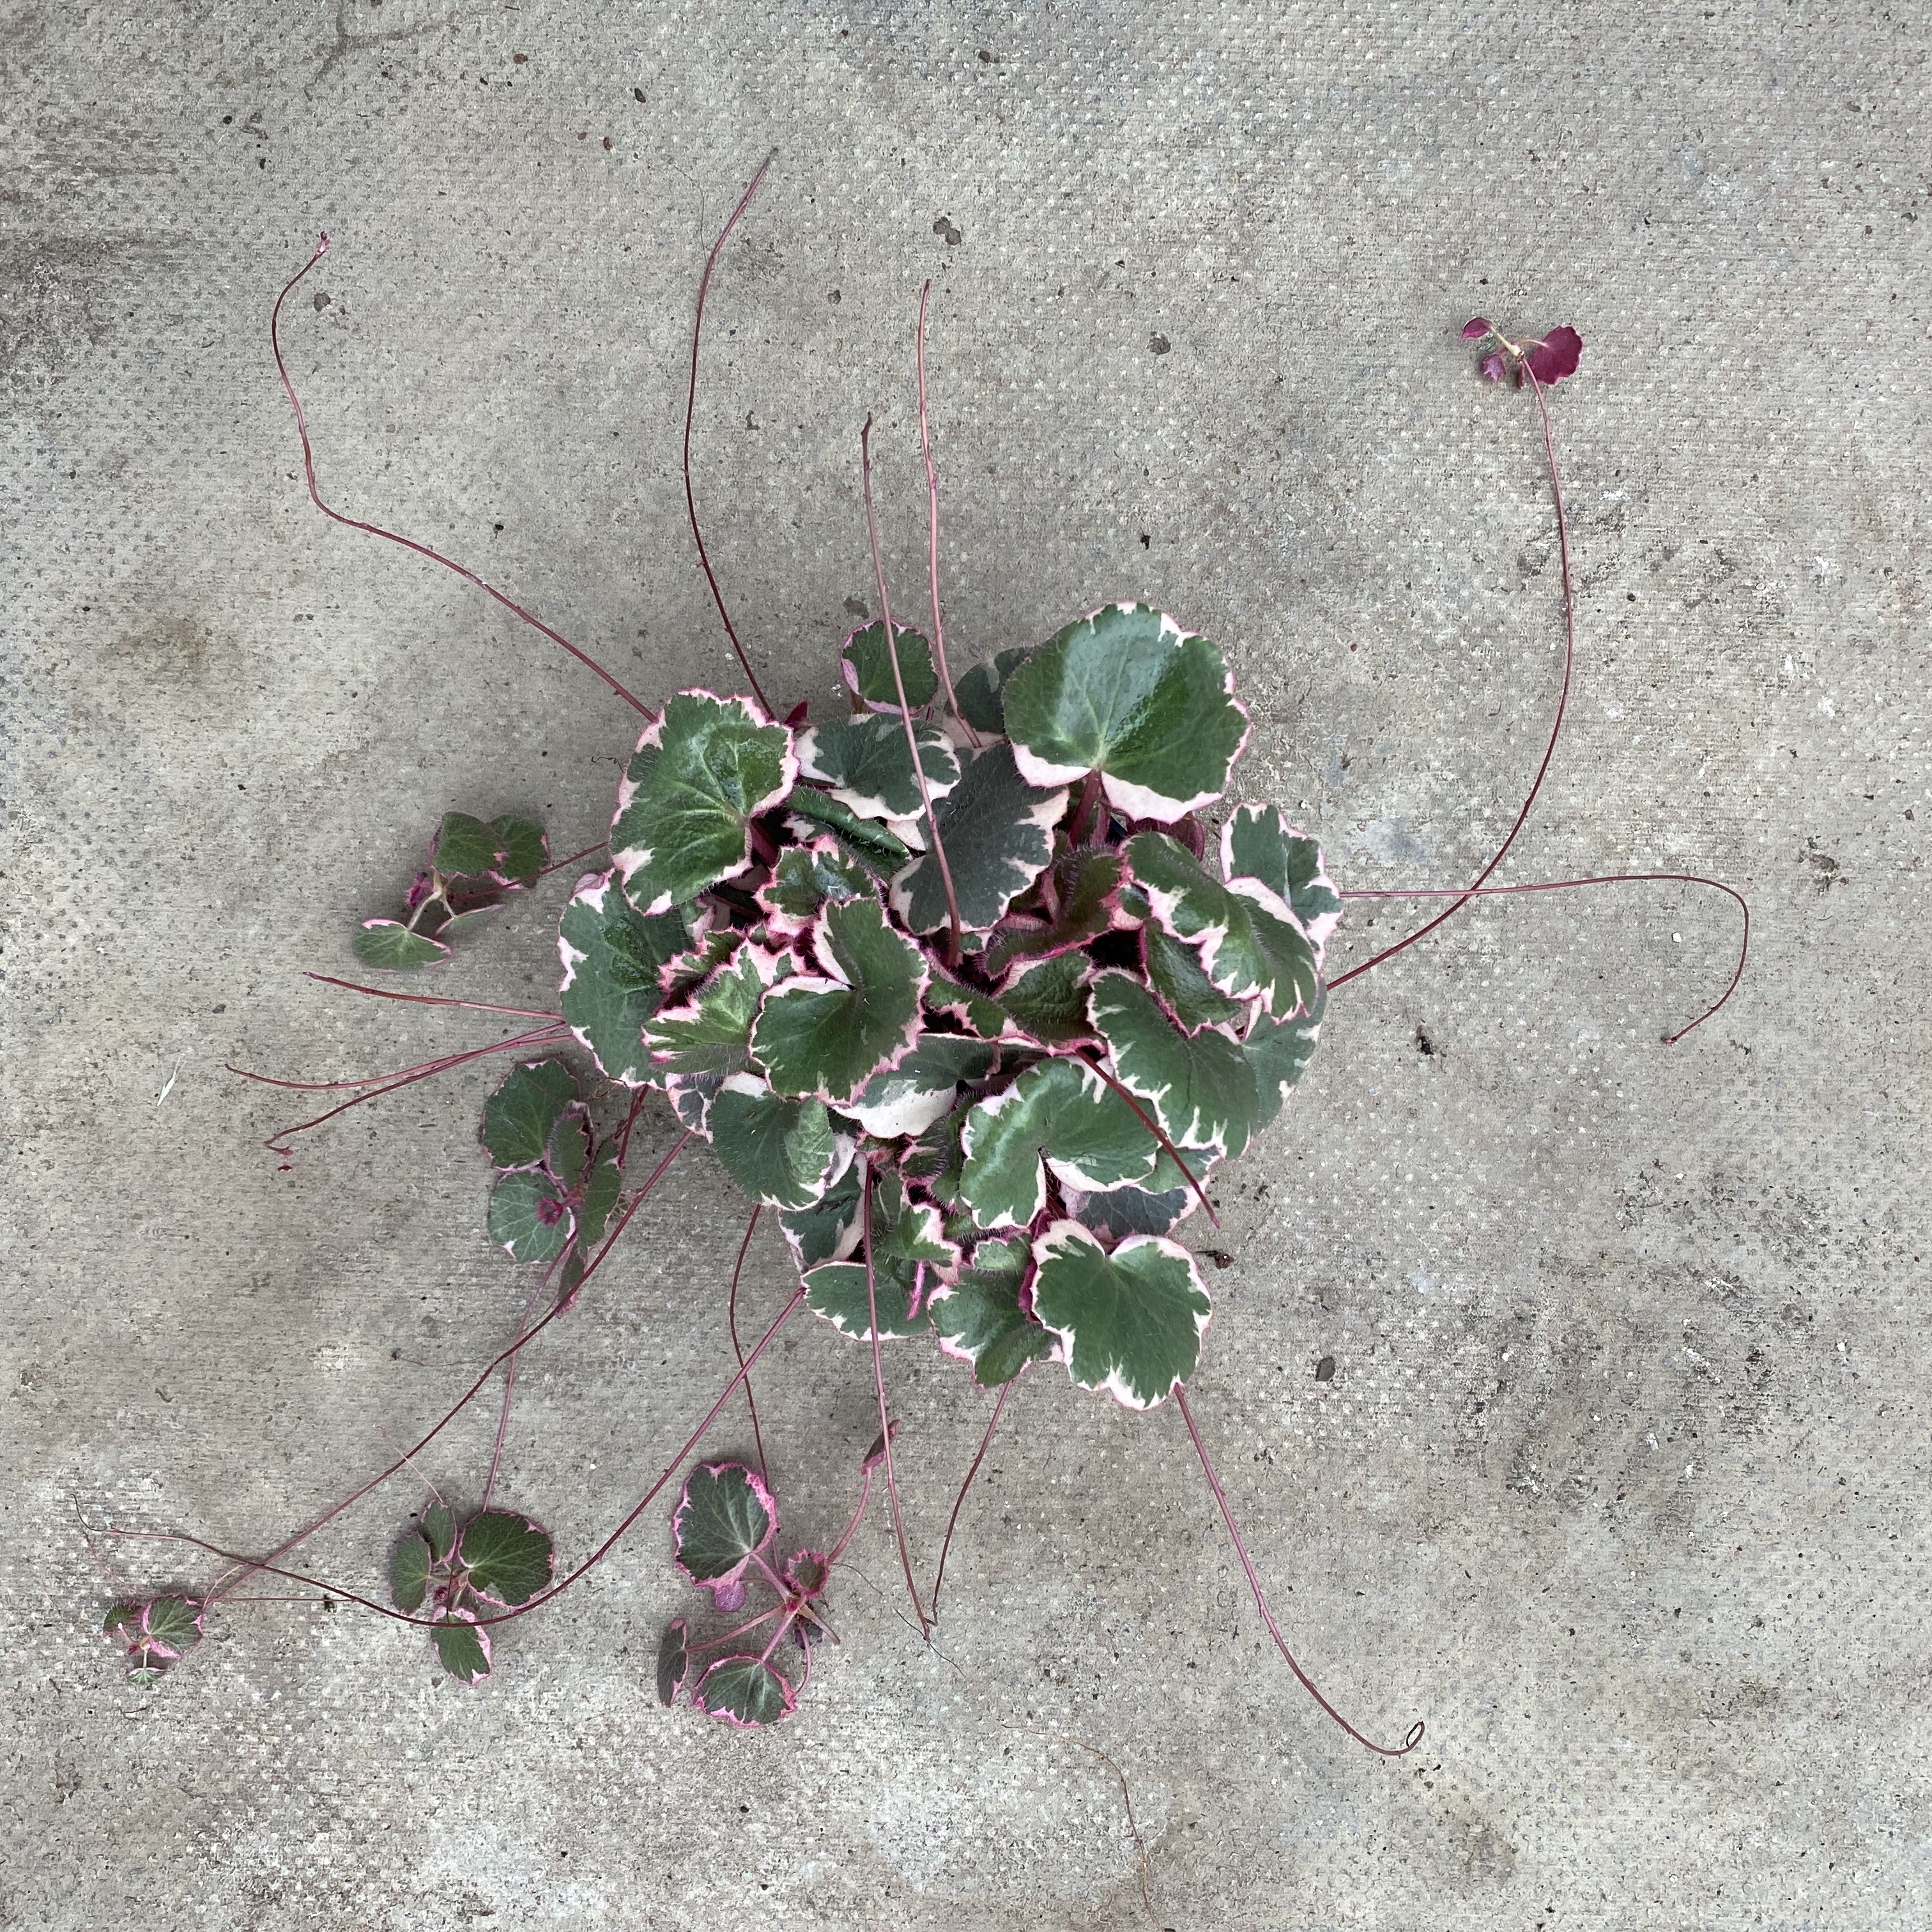 Saxifraga Stolonifera 'Tricolor' (Strawberry Begonia)